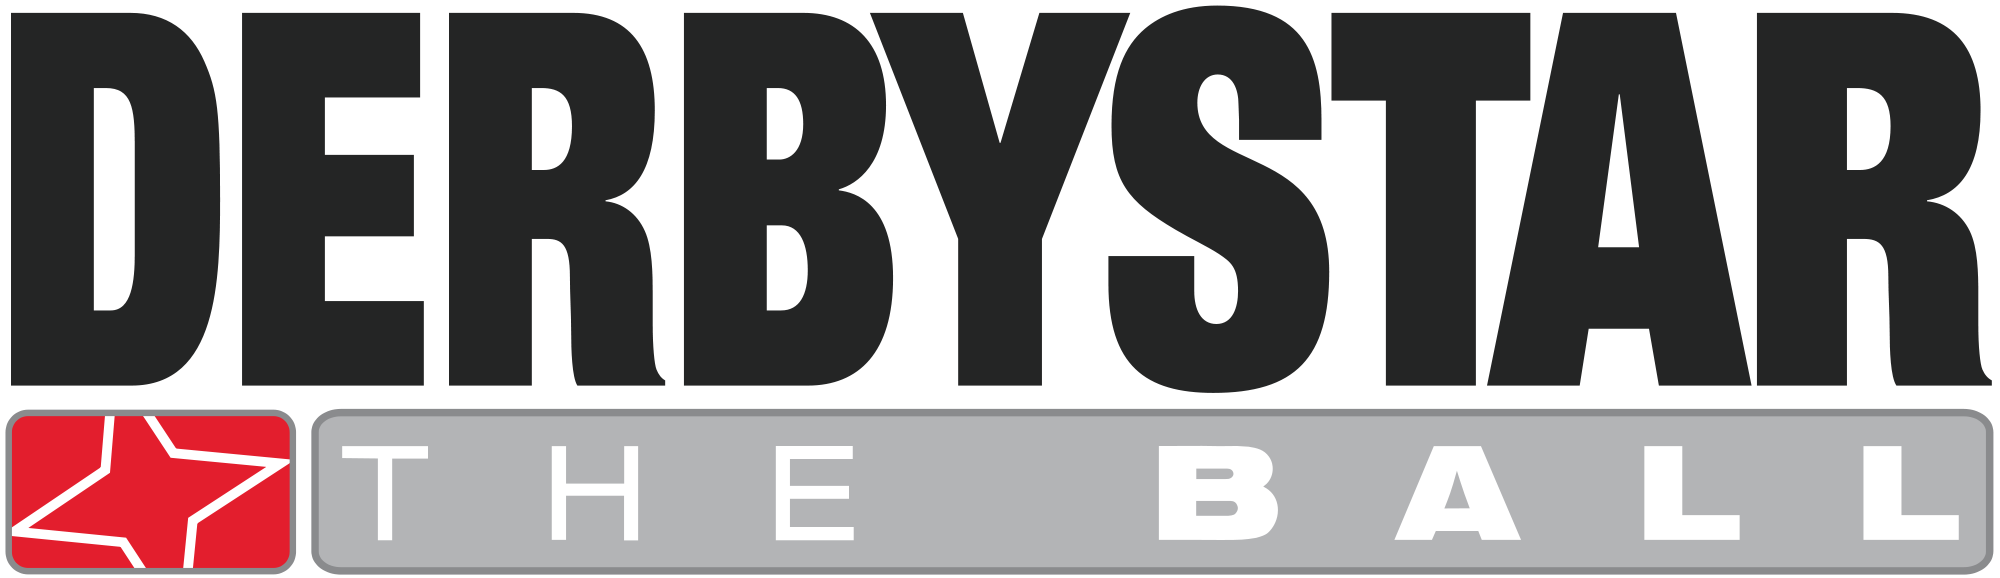 Derbystar-Logo